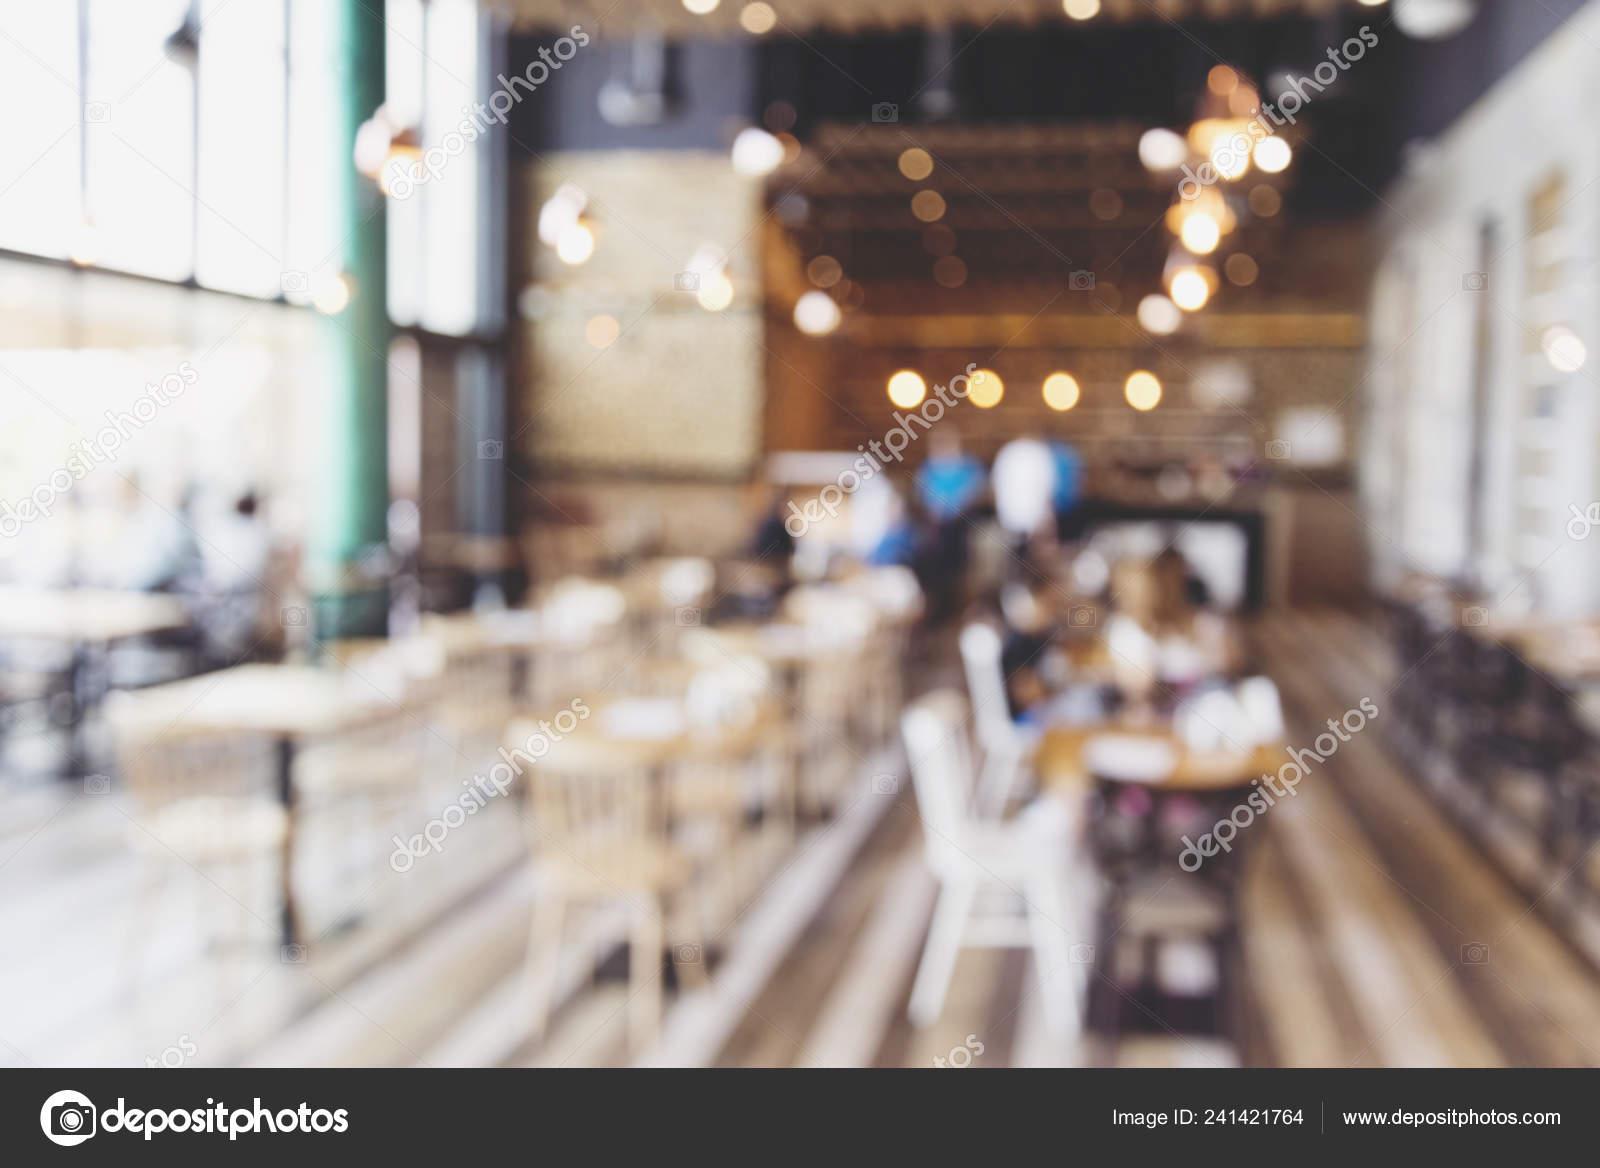 Blurred Background Modern Cafe Restaurant Table Blur Background Bokeh Light Stock Photo C Malija 241421764